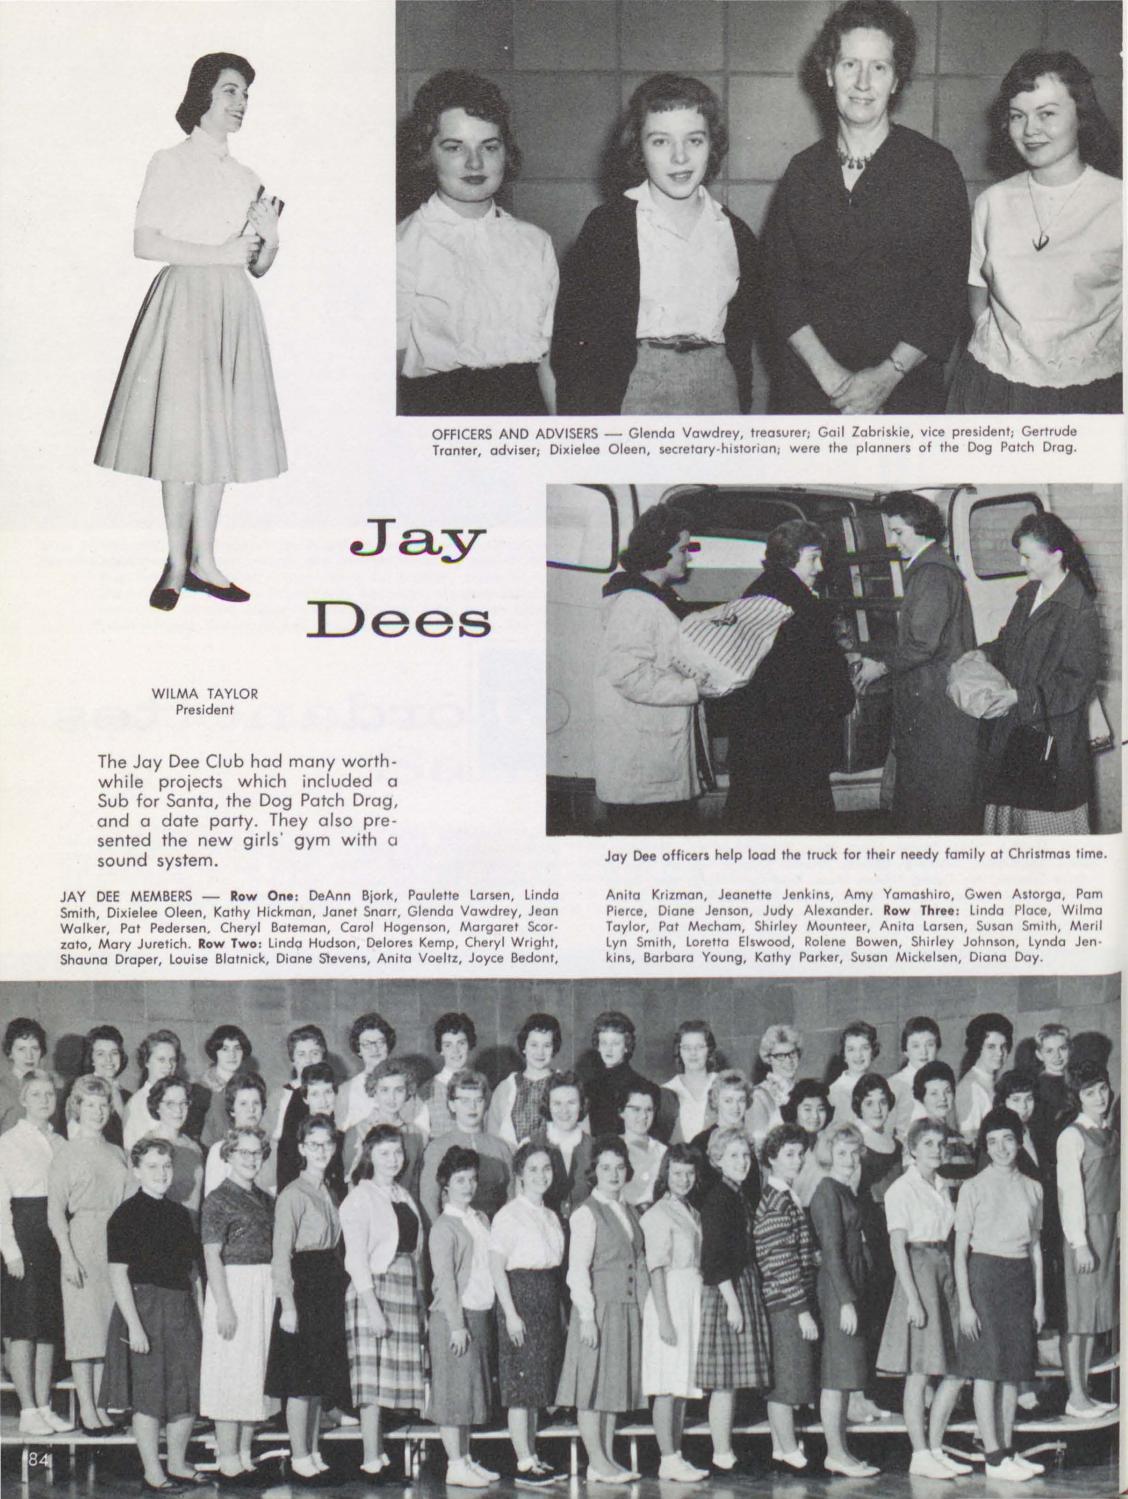 Forum on this topic: Deidre Hall born October 31, 1947 (age 71), jazz-raycole/